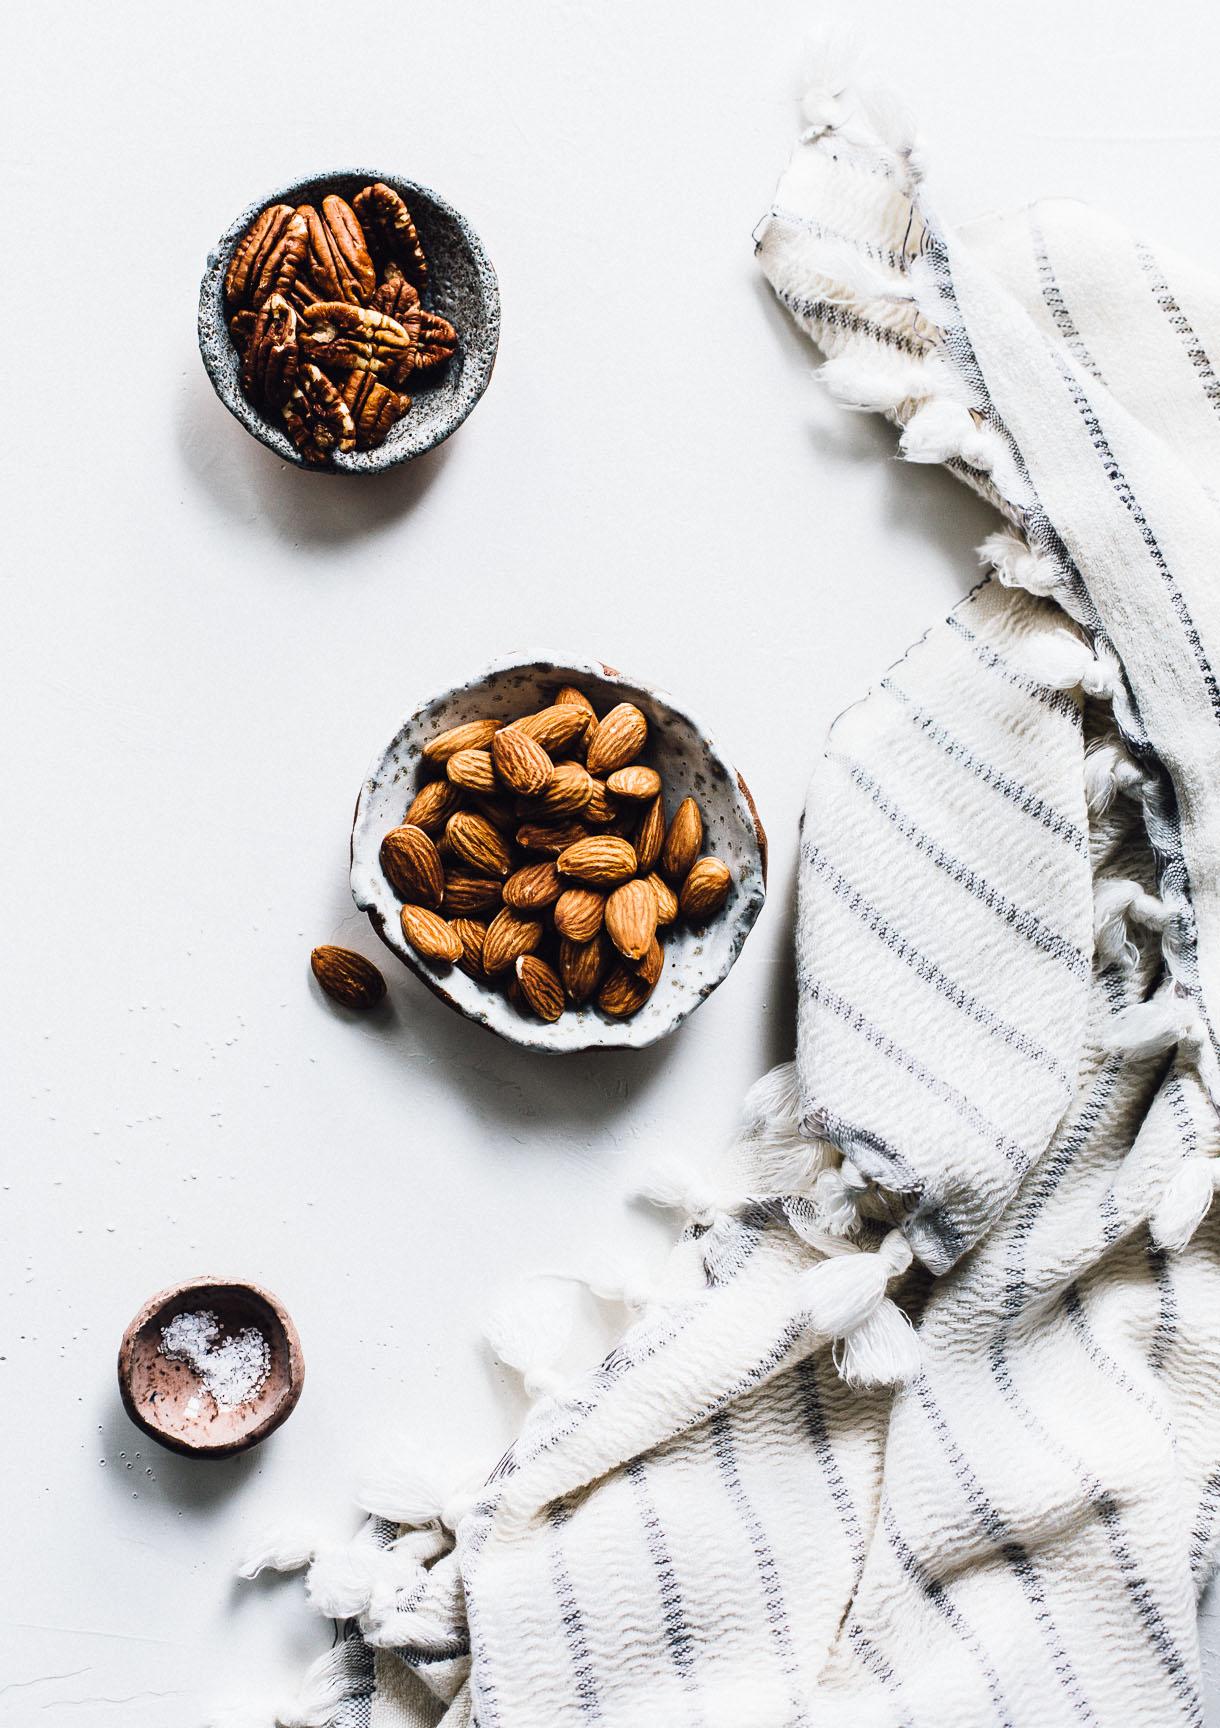 Homemade Almond Pecan Milk recipe : dairy-free milk, plant milk